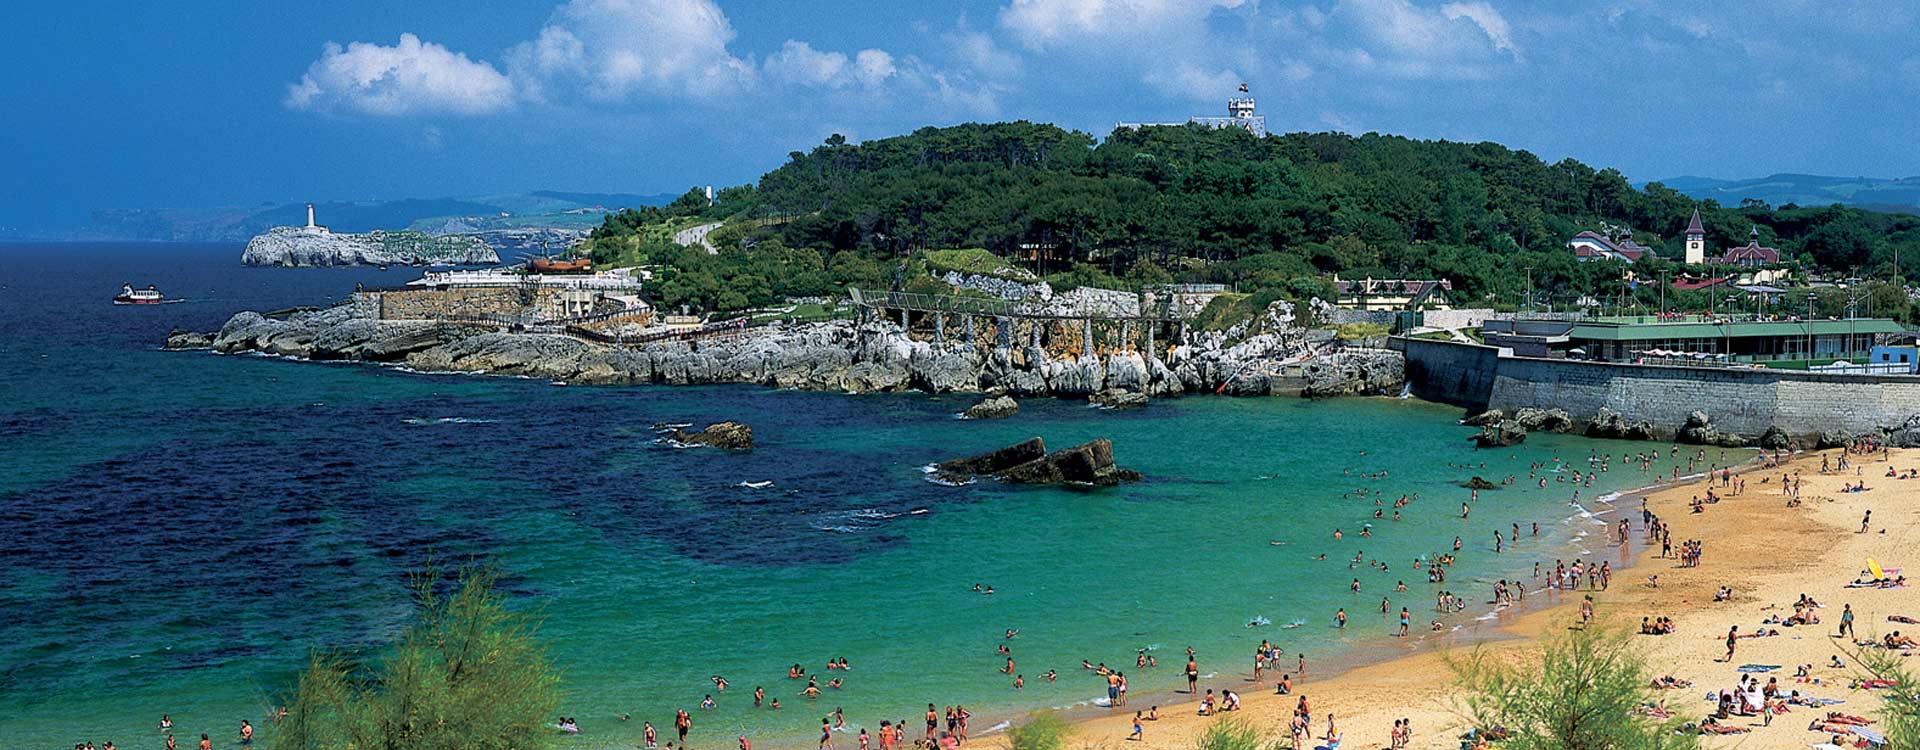 playas santander espana